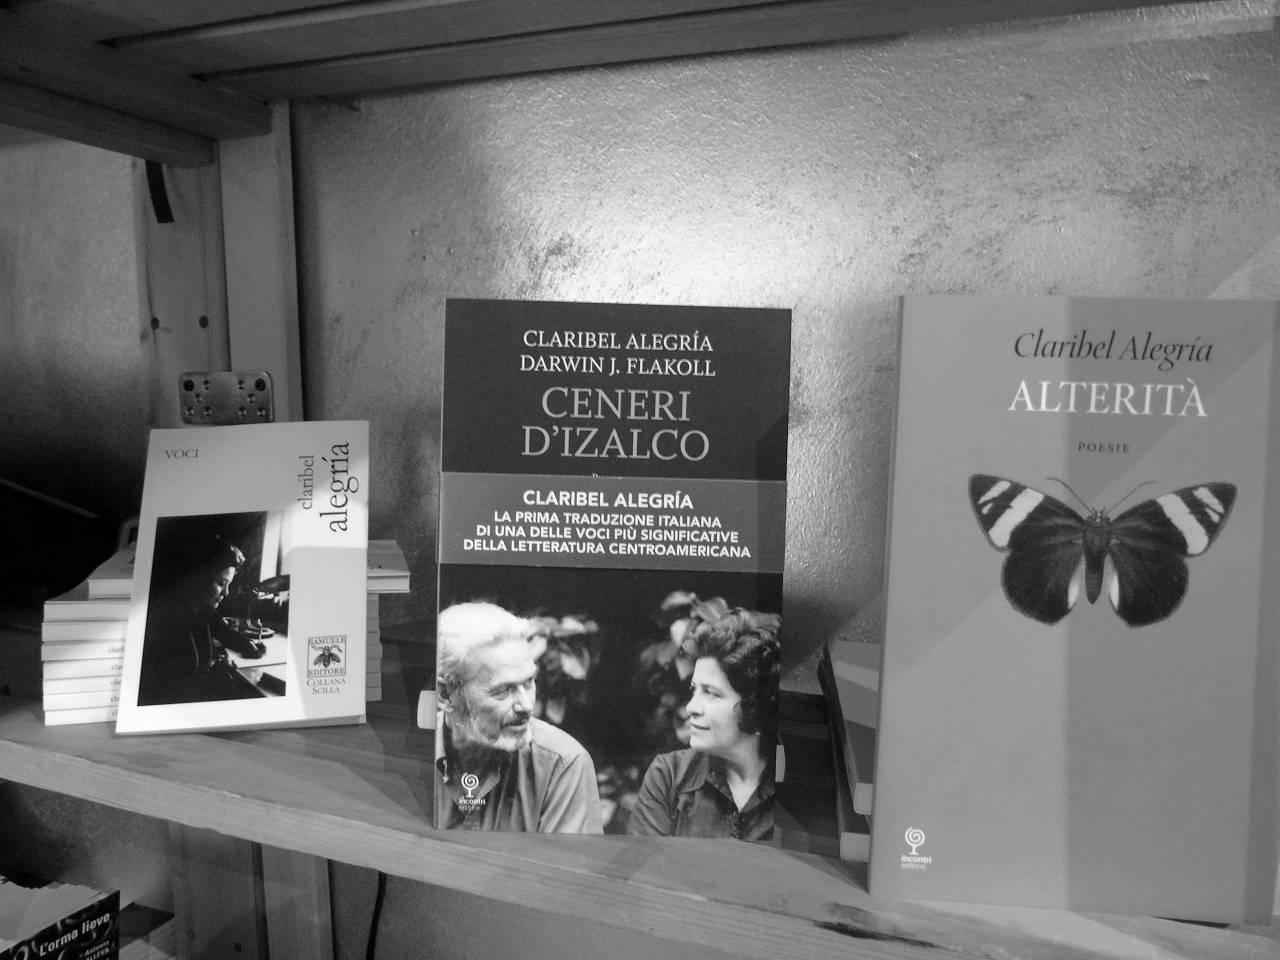 LA LEZIONE UMANA E POETICA DI CLARIBEL ALEGRÍA - 25 gennaio, Milano 6